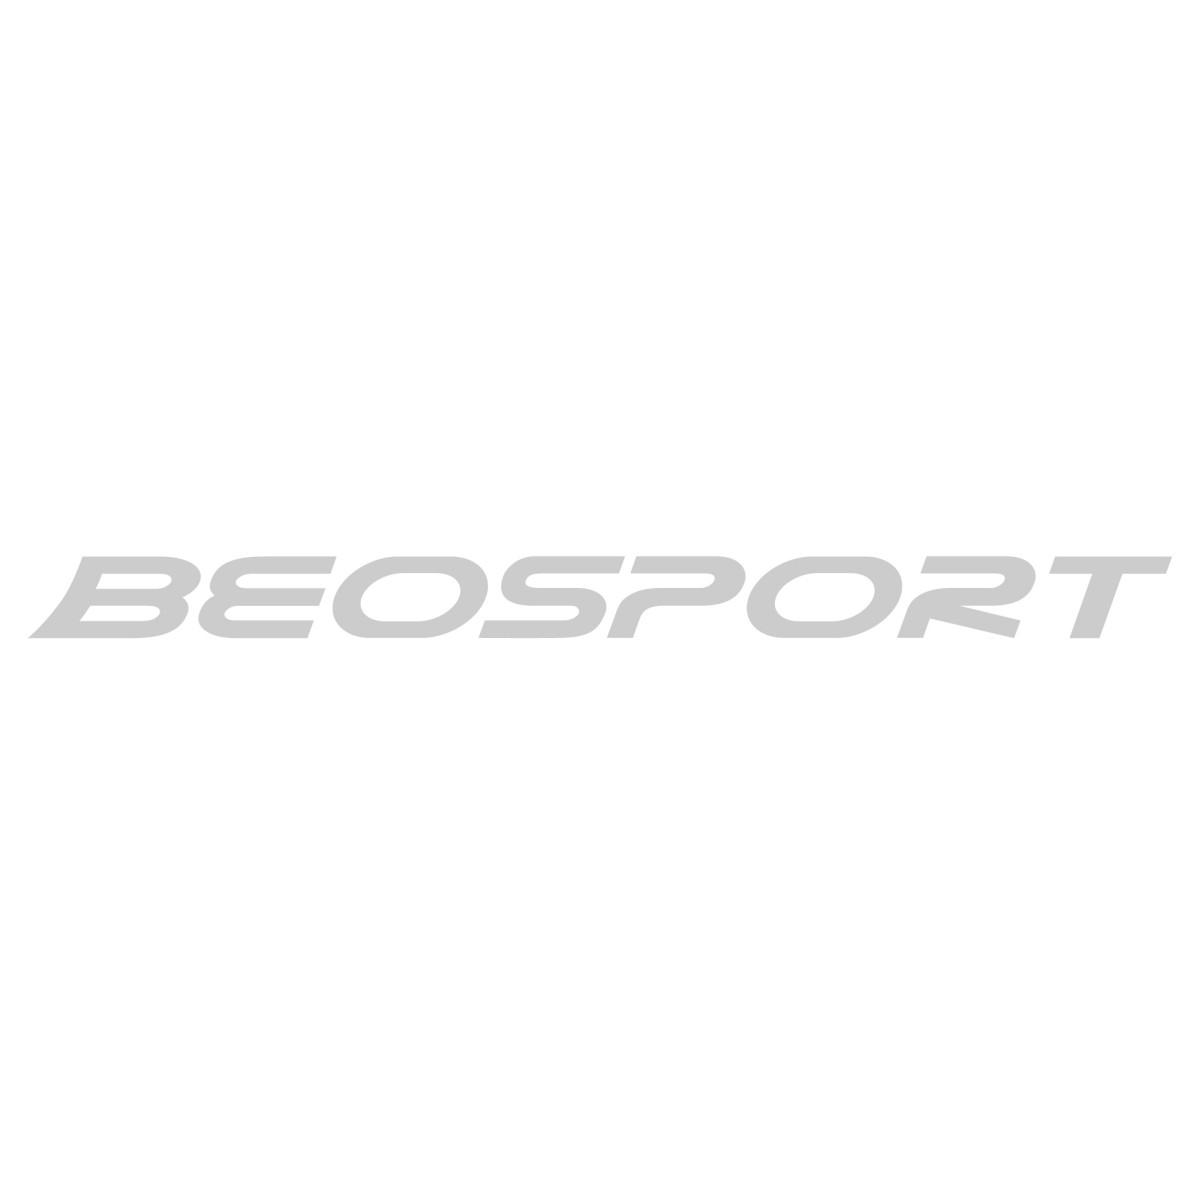 Skechers Pop Ups - Sheer Me Out papuče